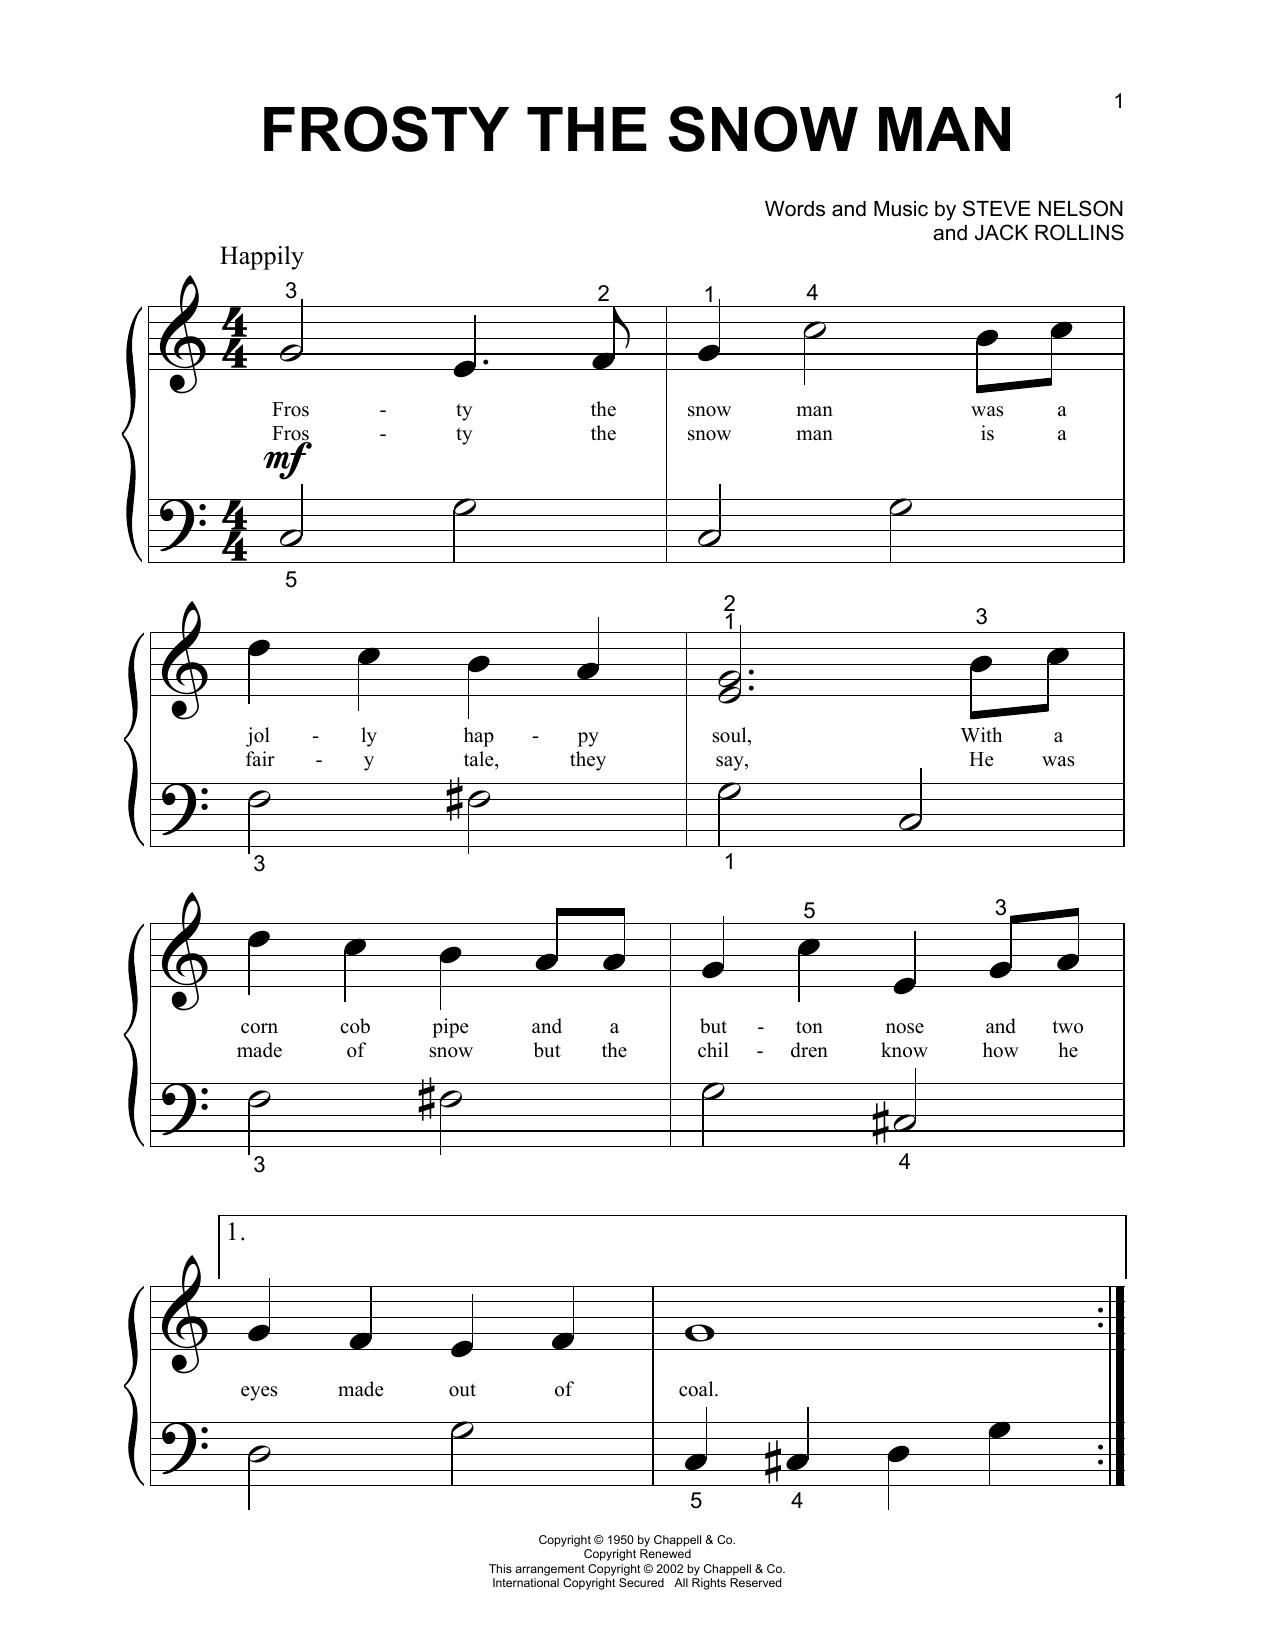 Frosty The Snow Man sheet music